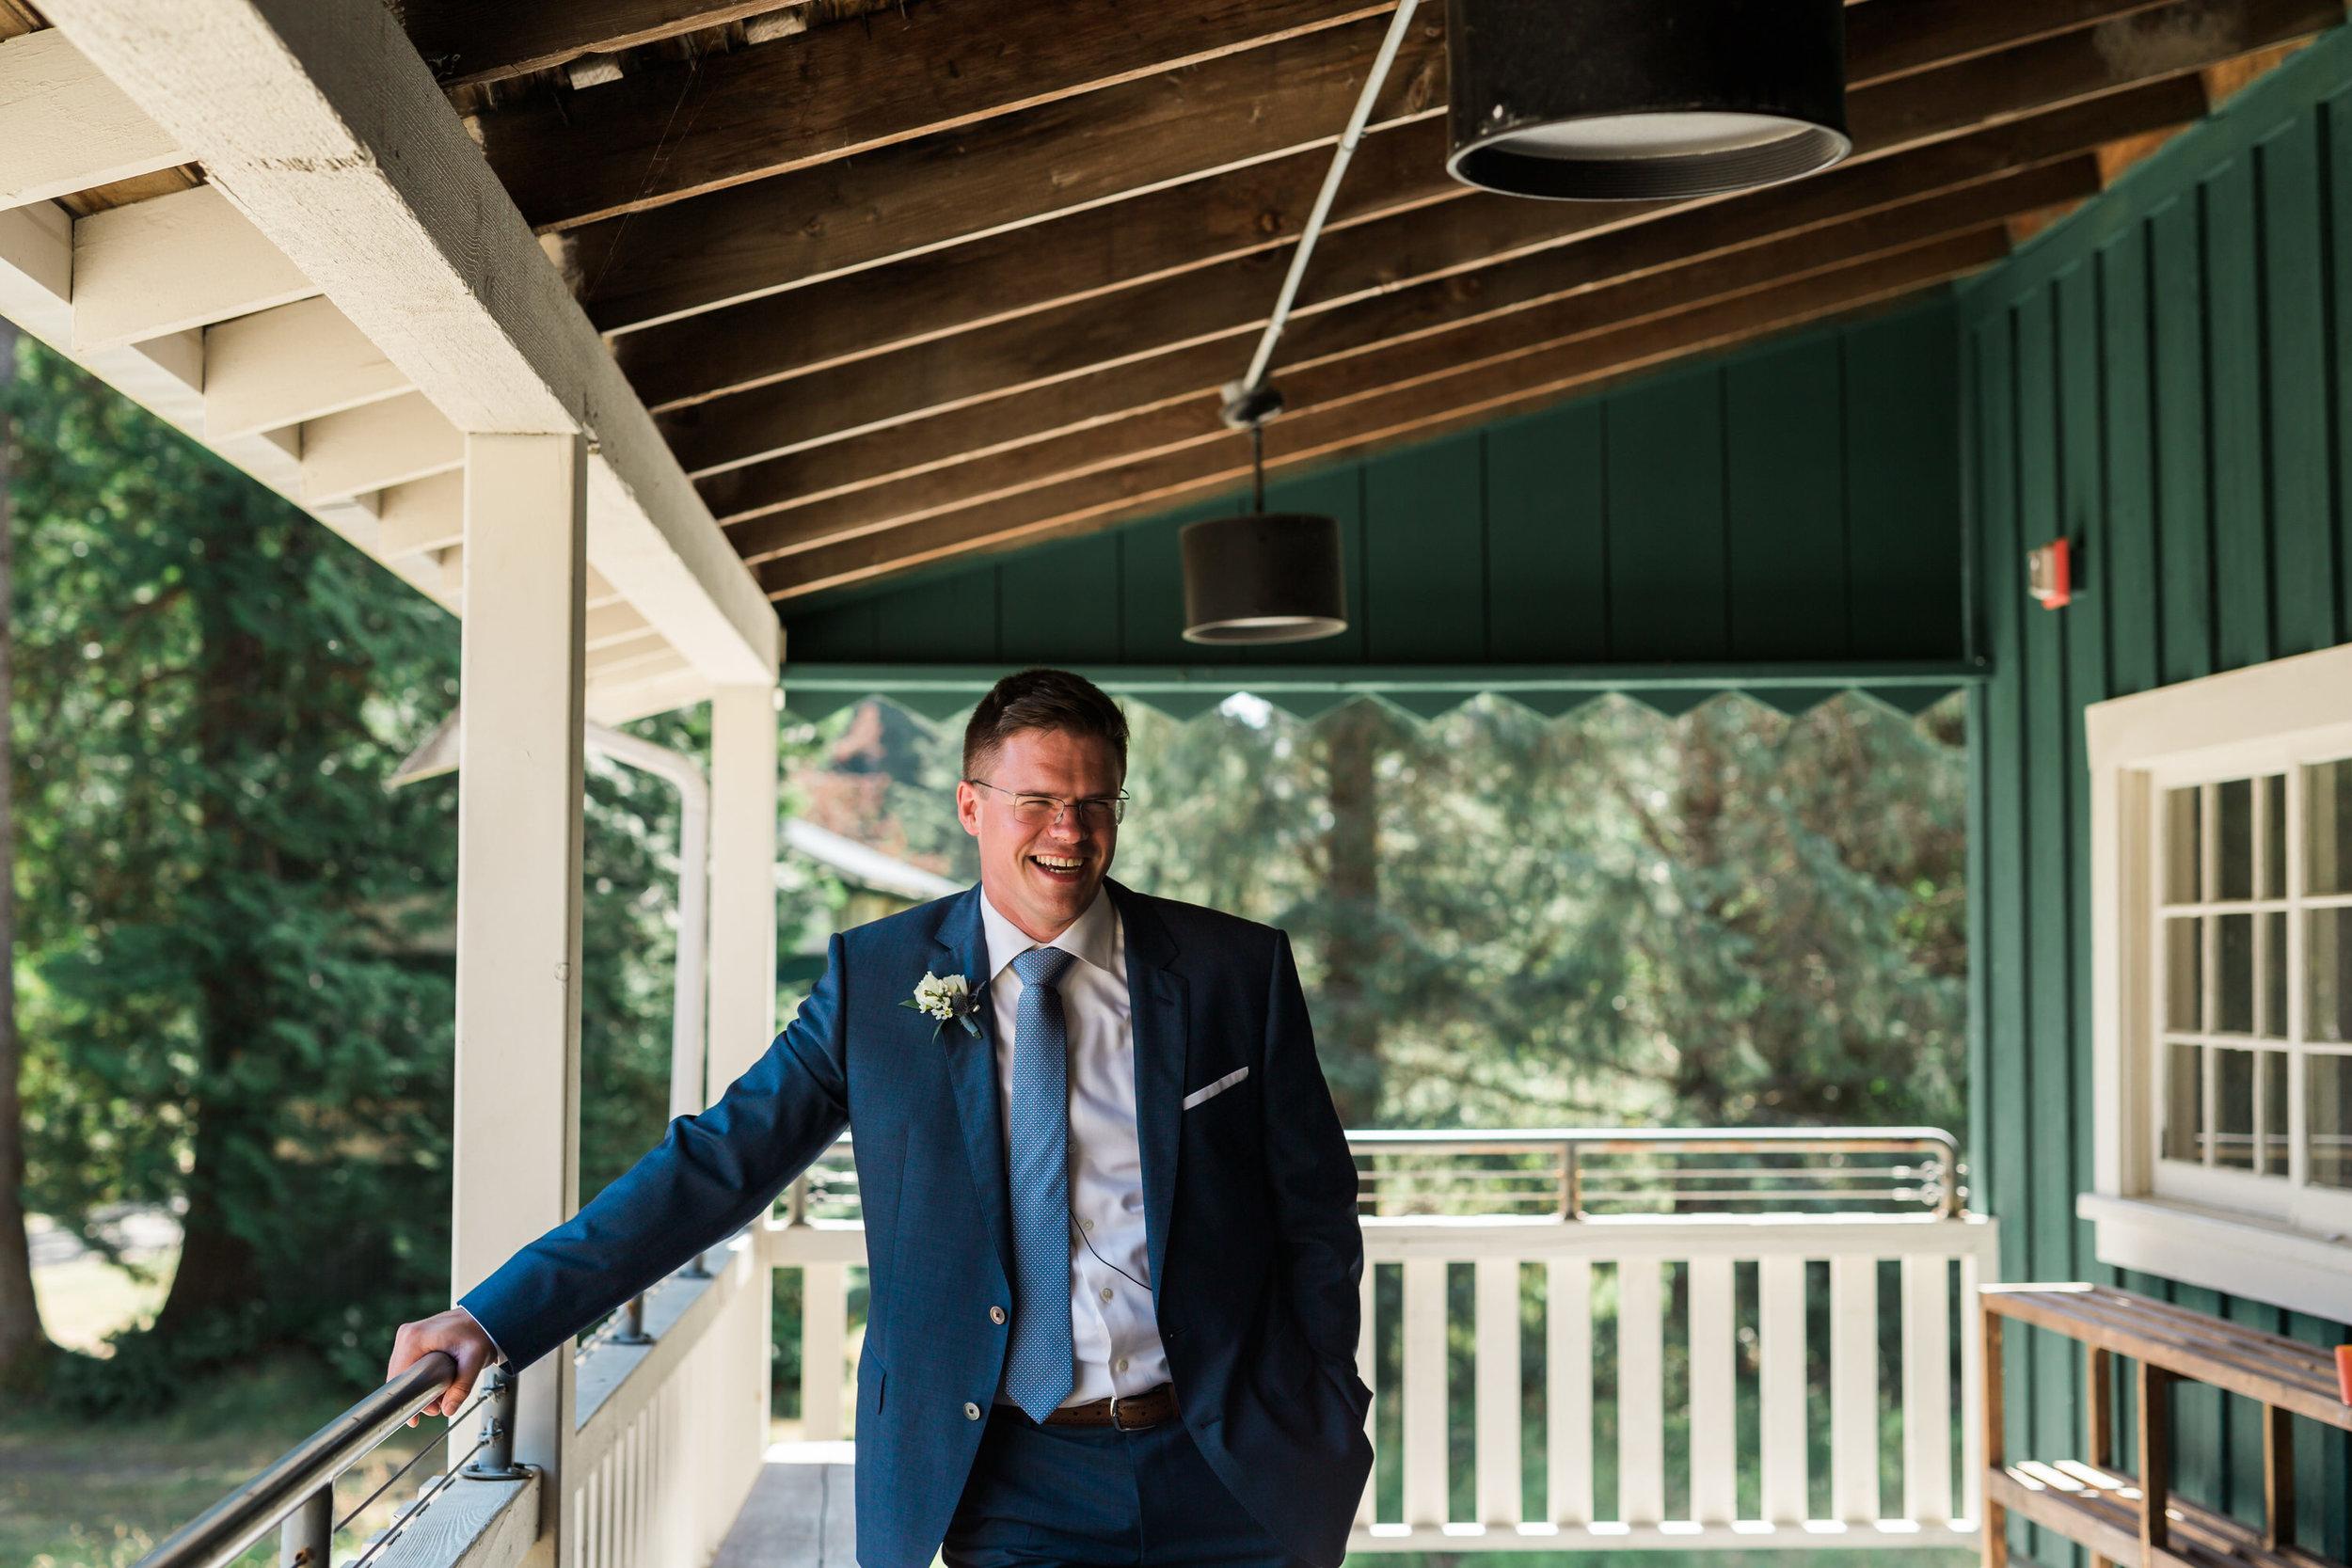 Camp Fircom Wedding - Vancouver Wedding Photographer & Videographer - Sunshine Coast Wedding Photos - Sunshine Coast Wedding Photographer - Jennifer Picard Photography - IMG_0444.jpg